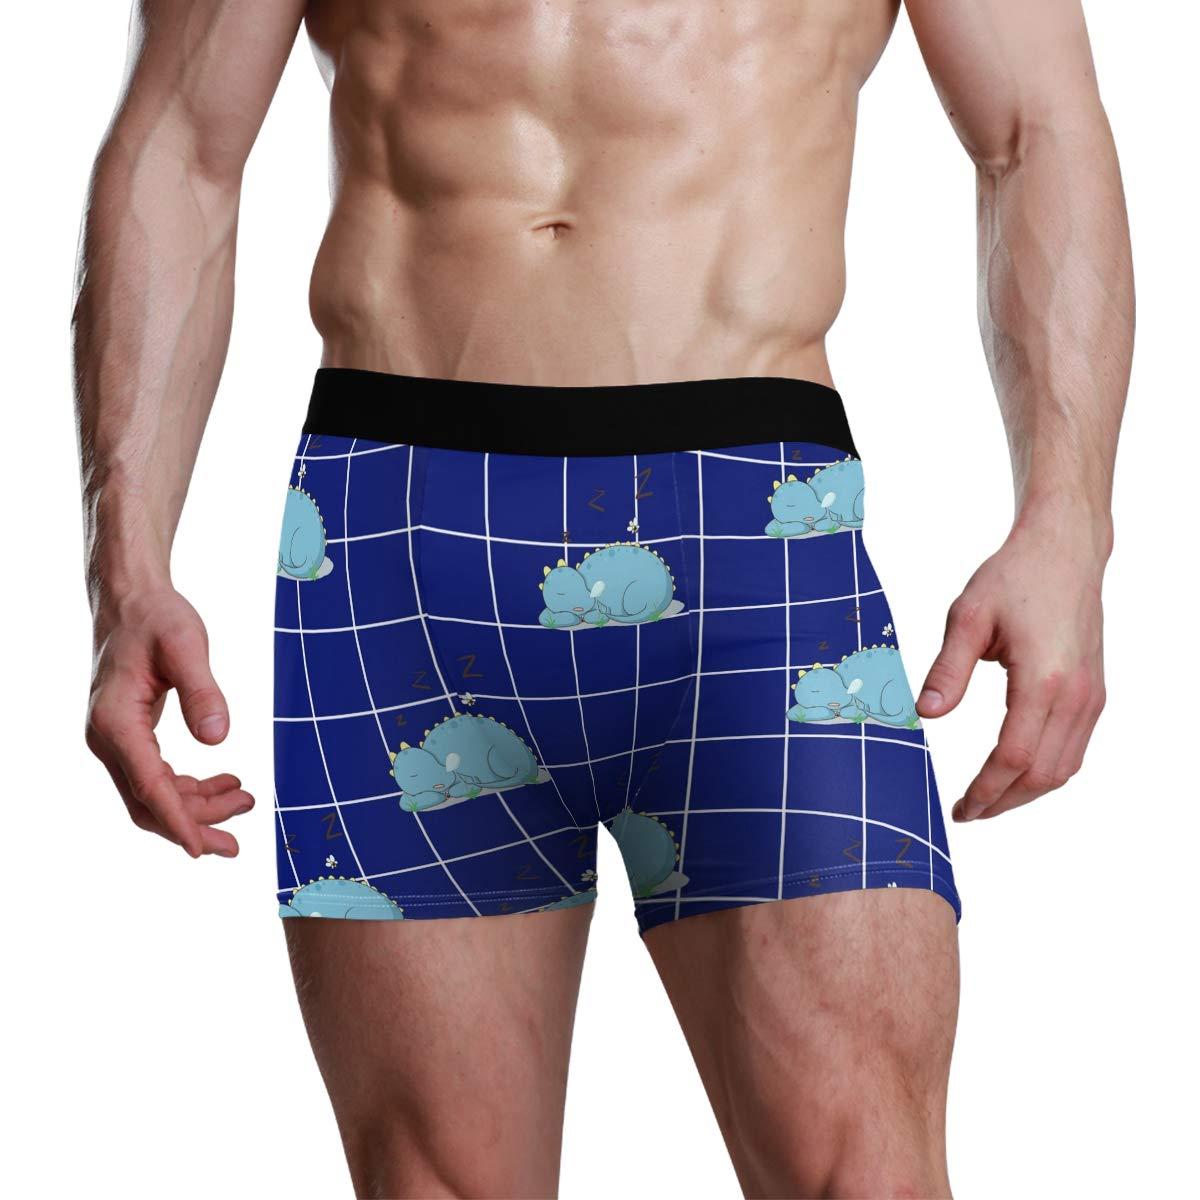 Vipsk Seamless Stretch Mens Polyester Boxer Briefs Underwear 1-Pack Set Dinosaur is Sleeping